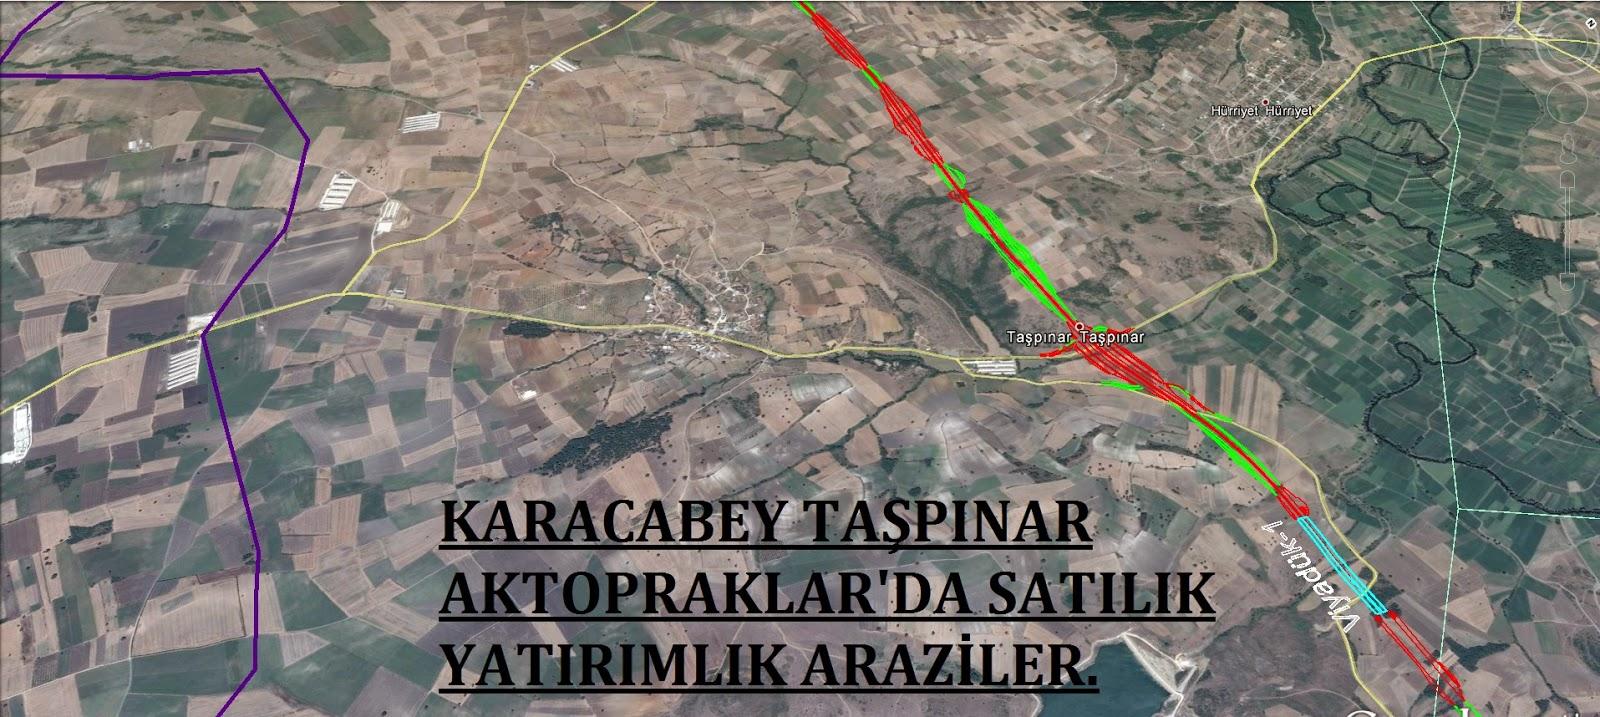 http://www.dijitalemlak.com.tr/ilan/2203353_karacabey-taspinar-aktopraklarda-21500-m2-satilik-arazi.html